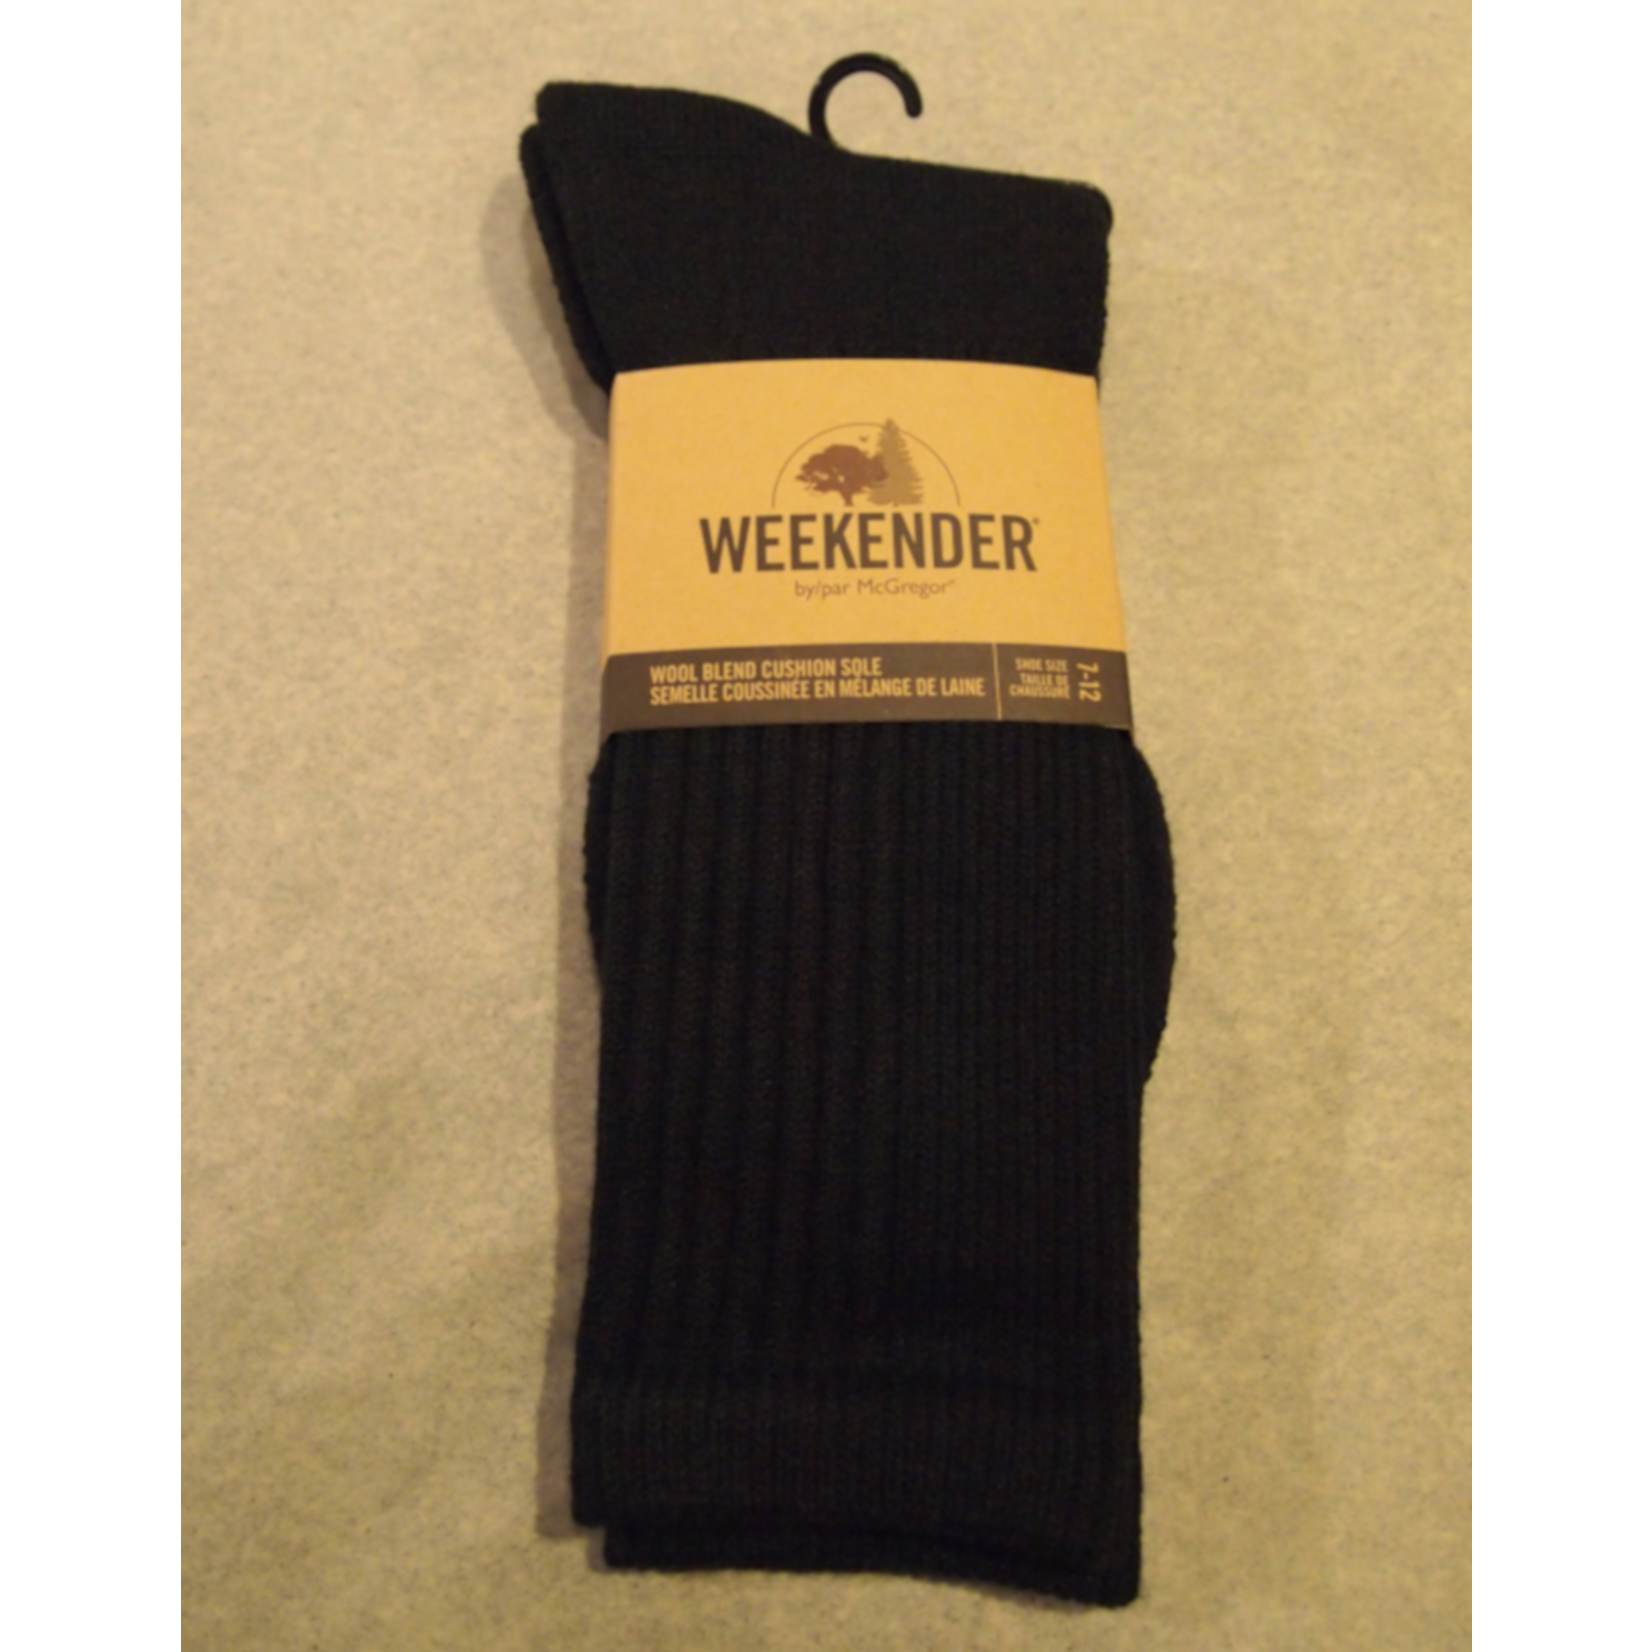 McGregor McGregor Weekender Wool Blend Black